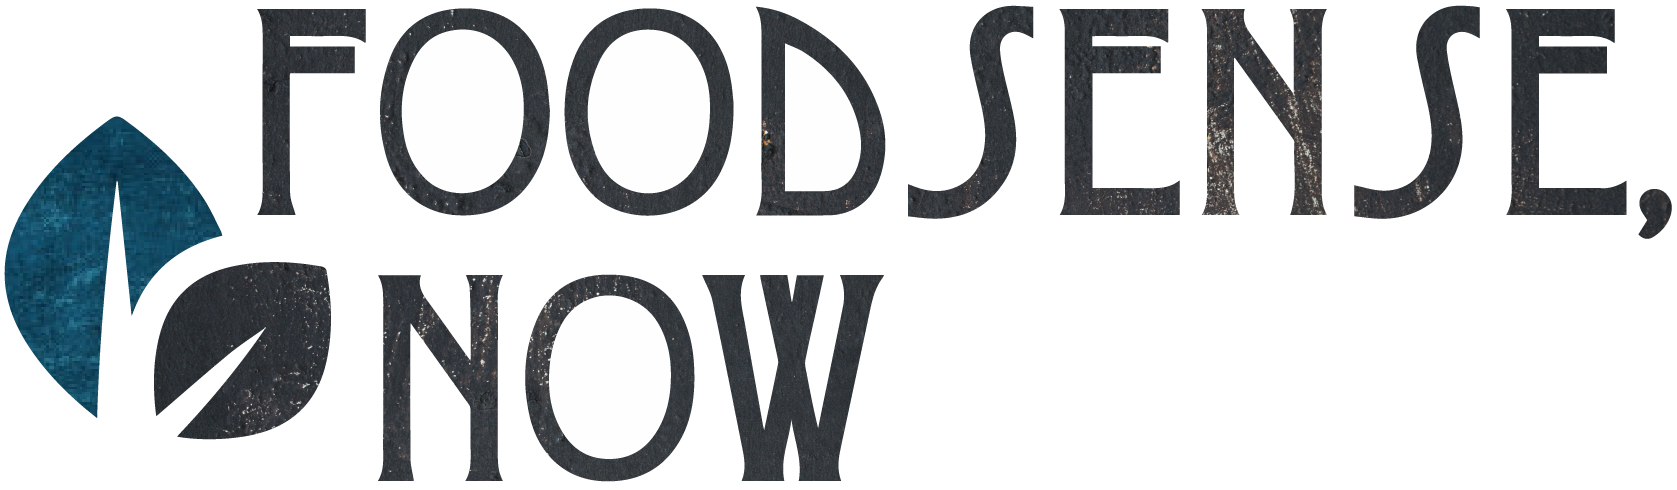 FoodSenseNow